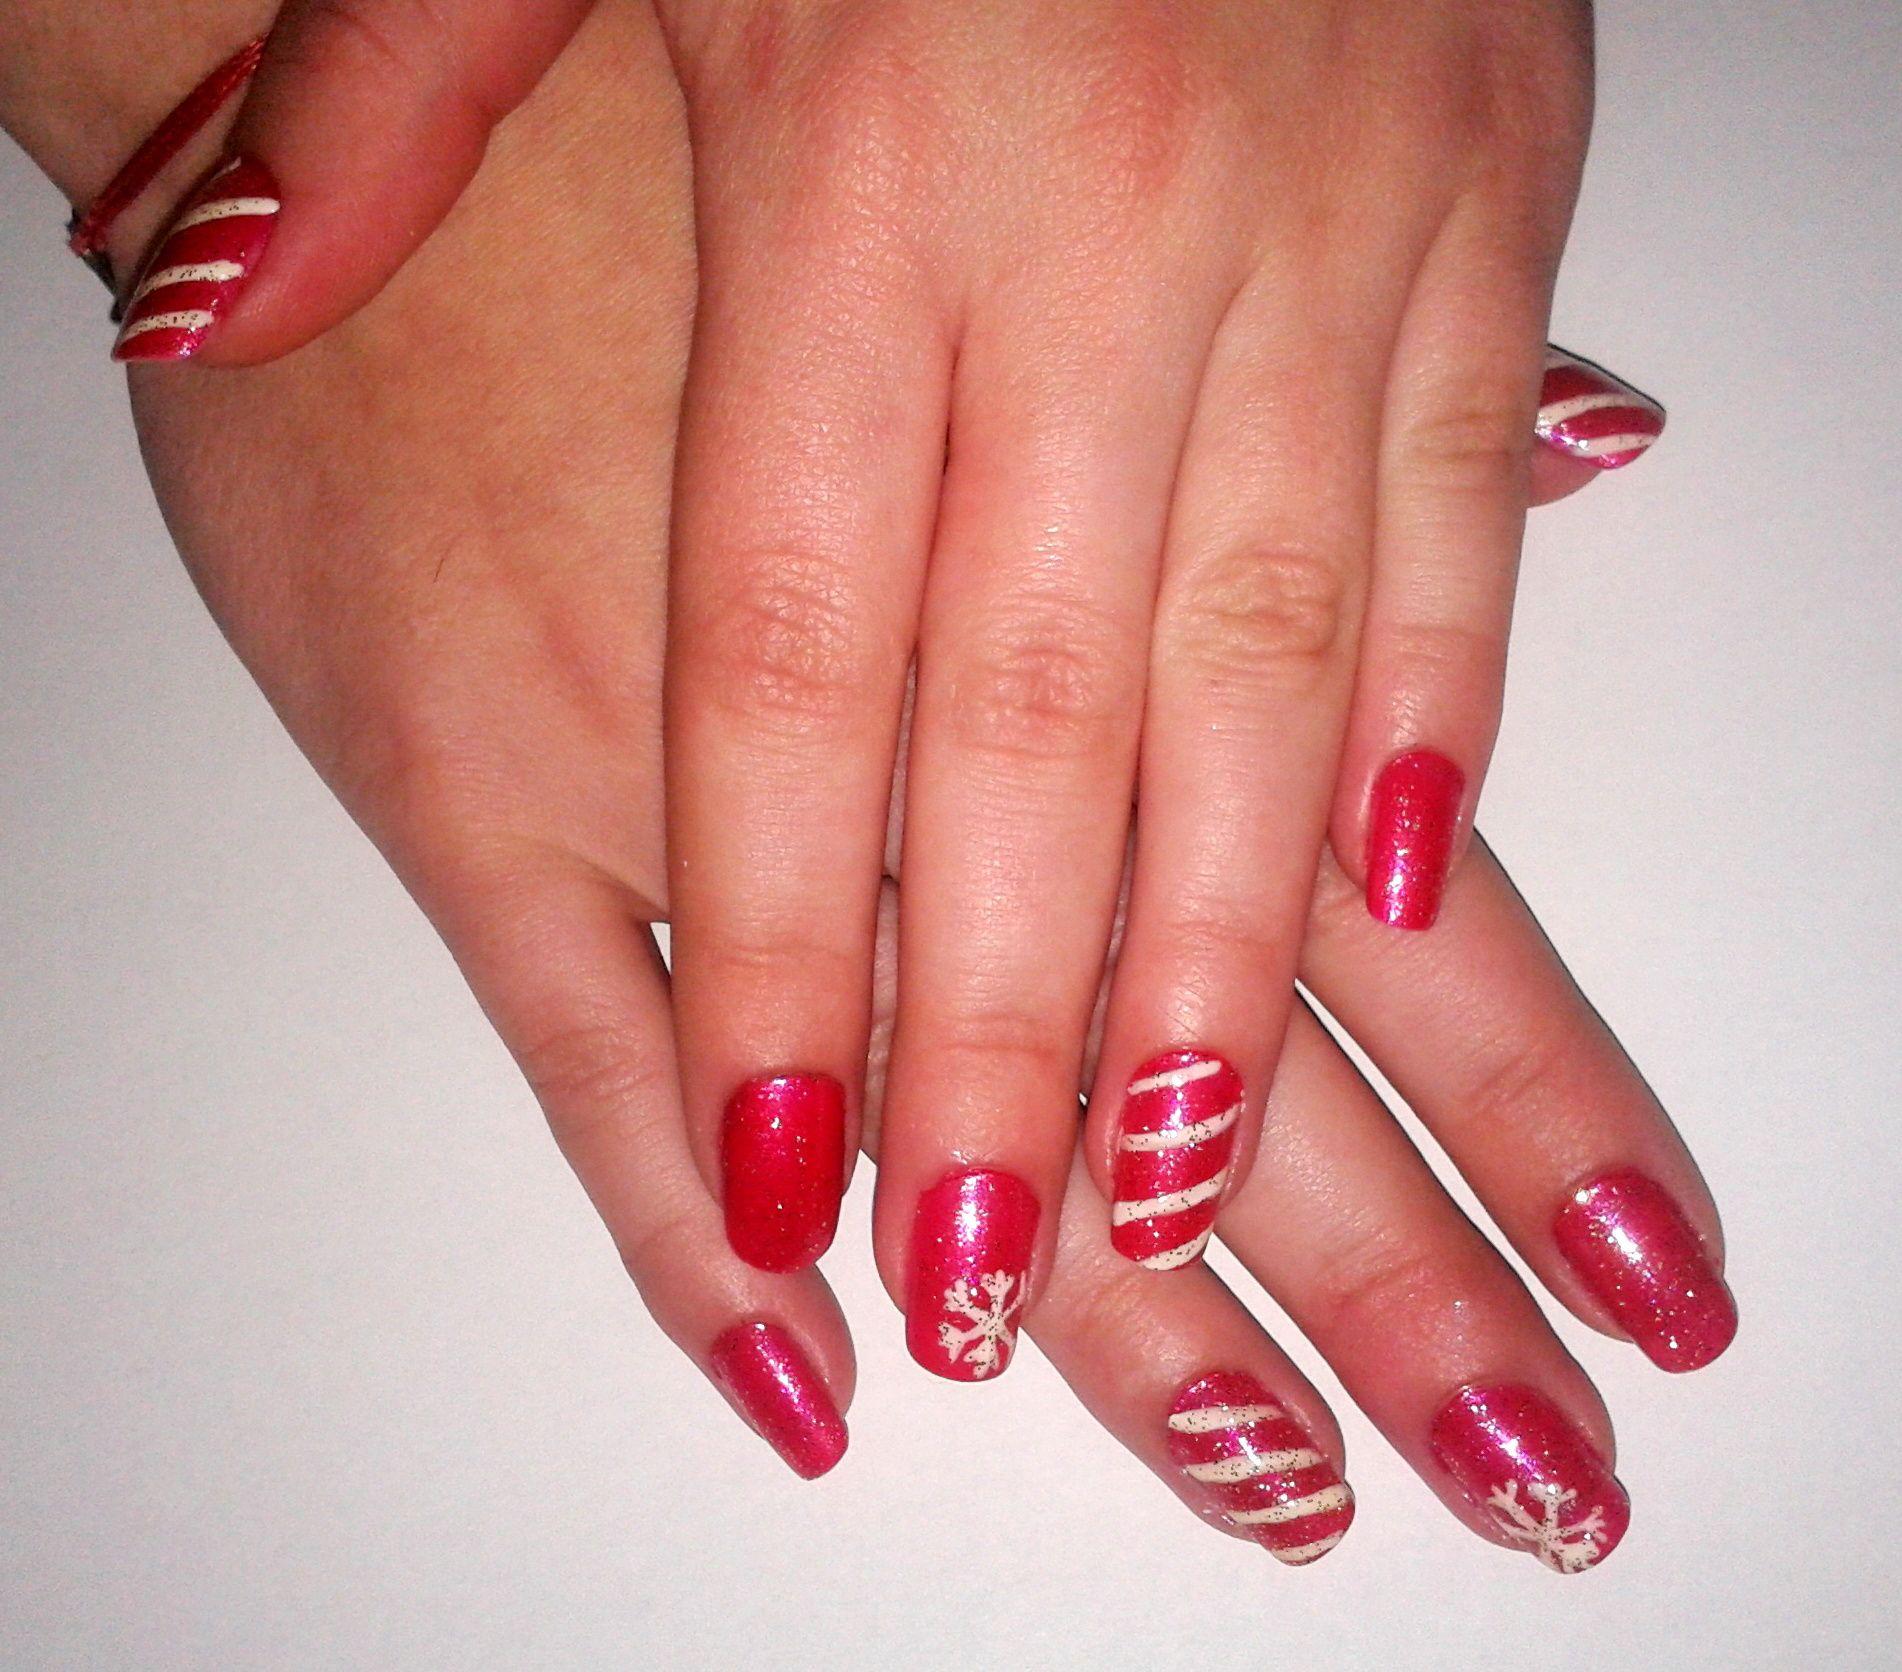 #Christmas Nails #lollipop #snowflake #sparkle #red